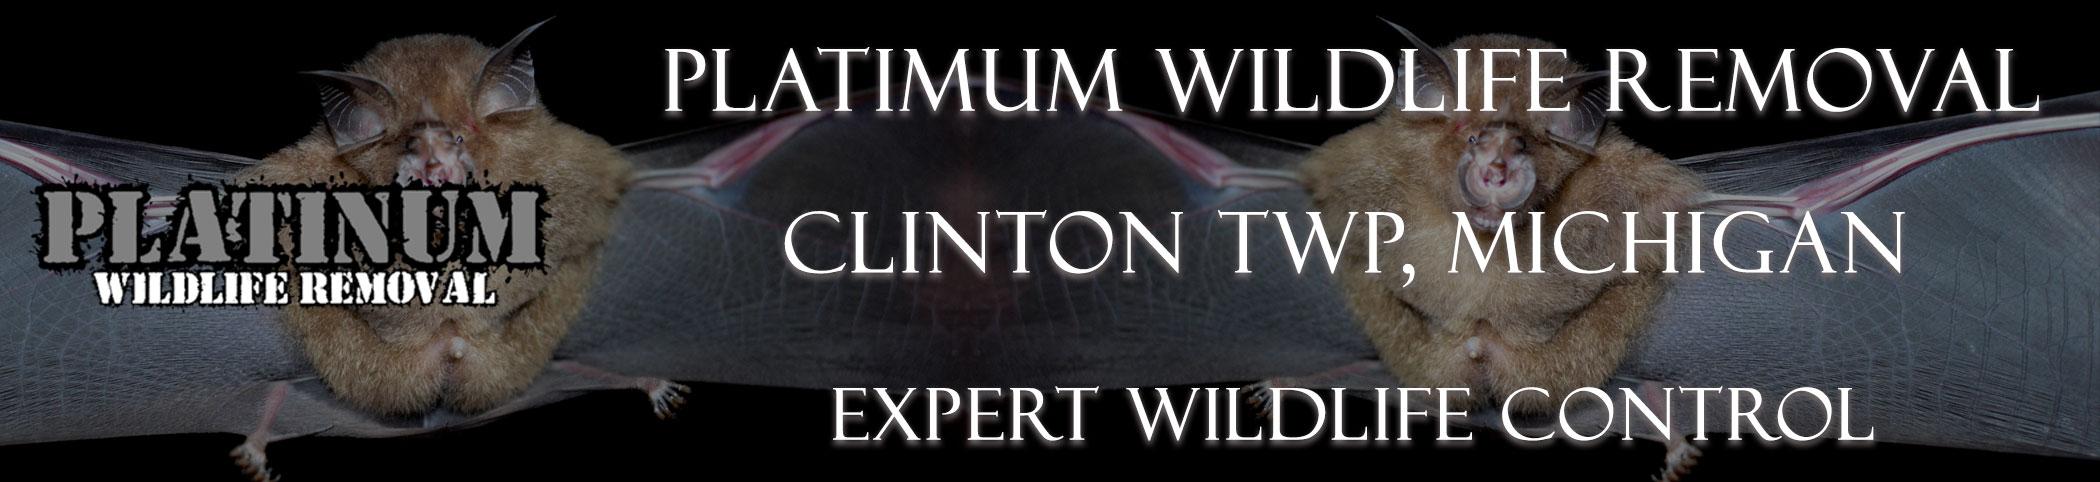 Clinton-TWP-Platinum-Wildlife-Removal-michgan